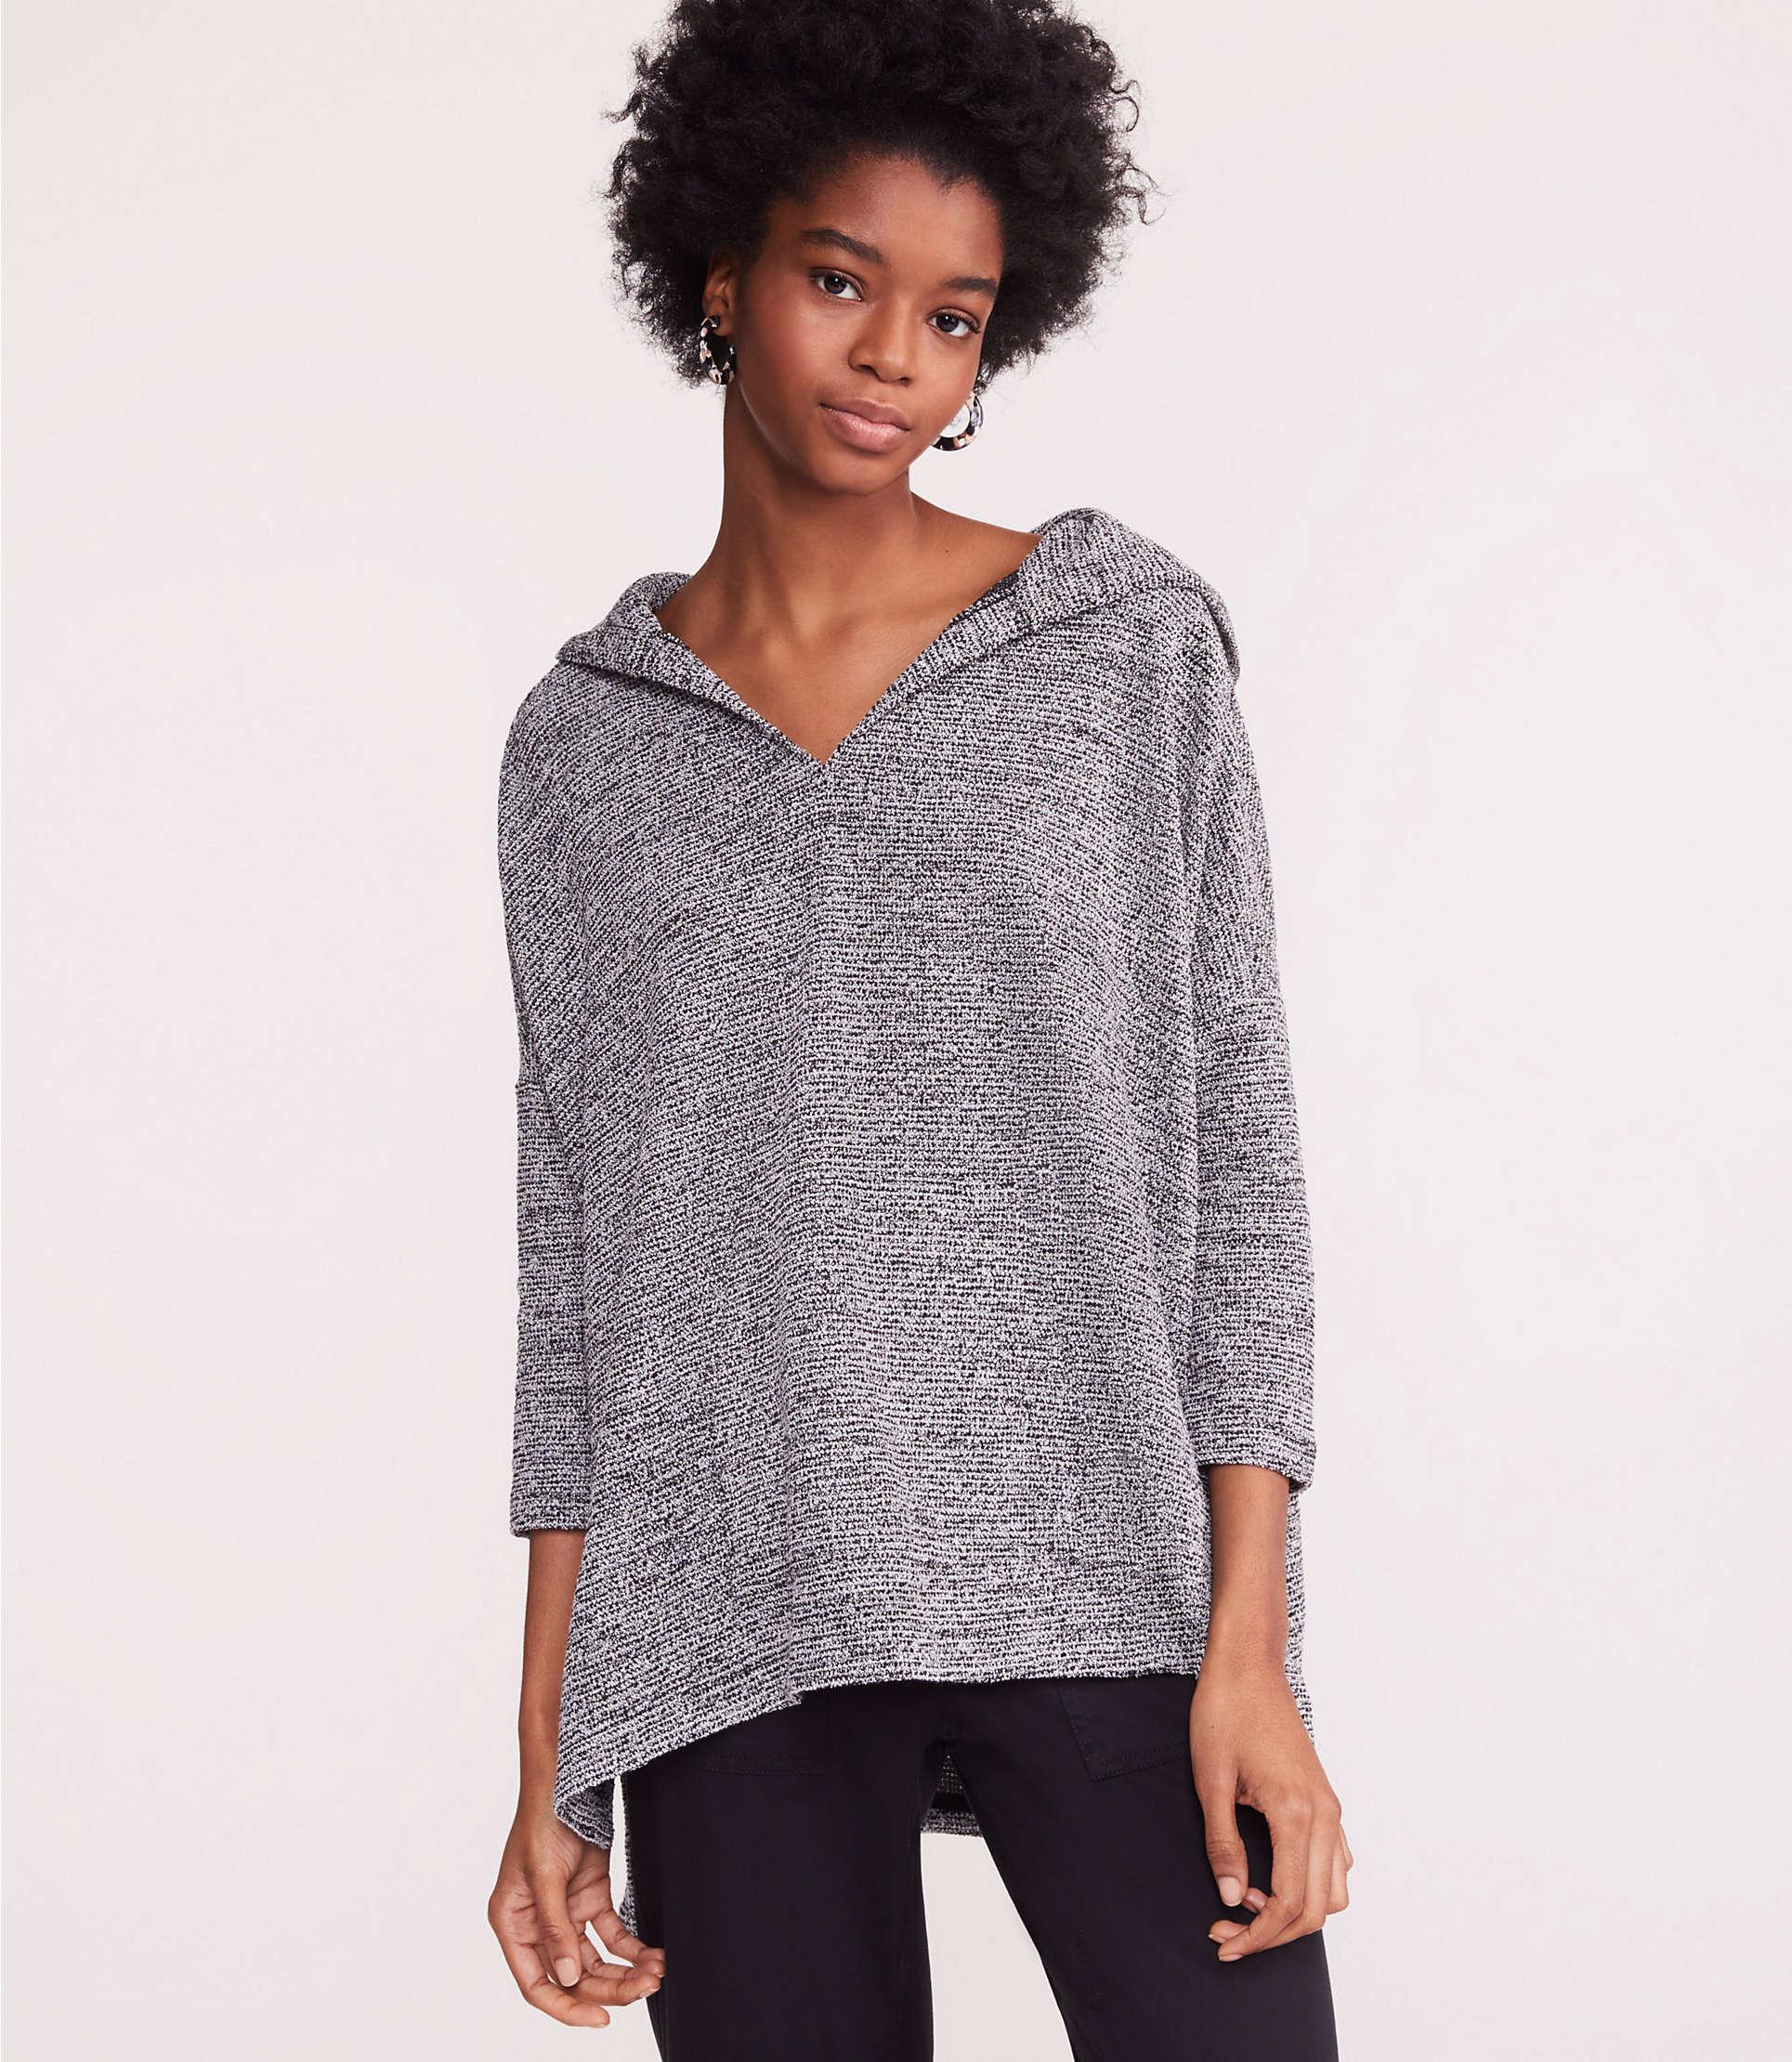 e33219ff00fa7 Lyst - Lou & Grey Boucle Tweed Hoodie Top